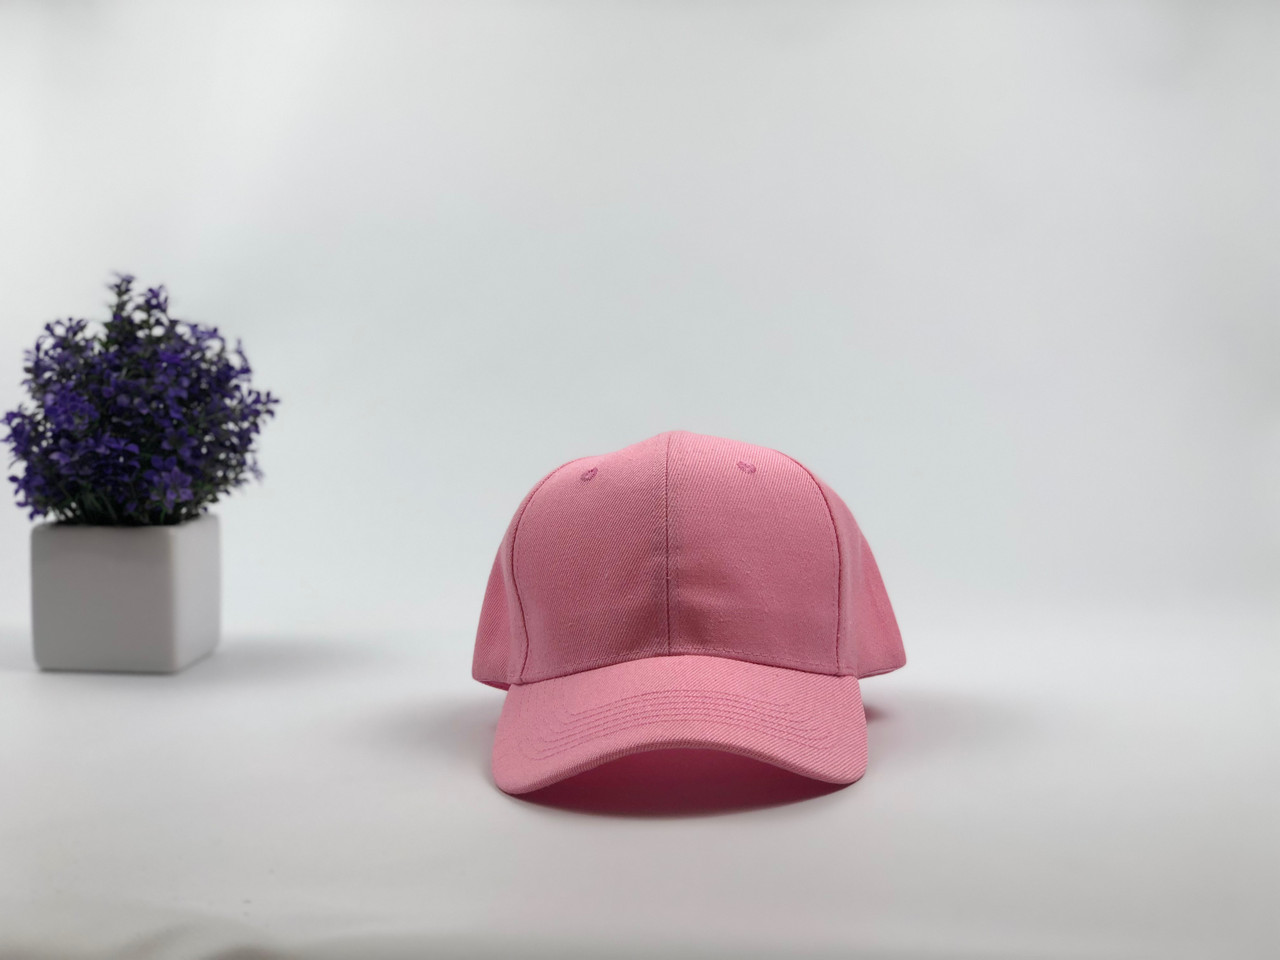 Кепка бейсболка Style (розовая)